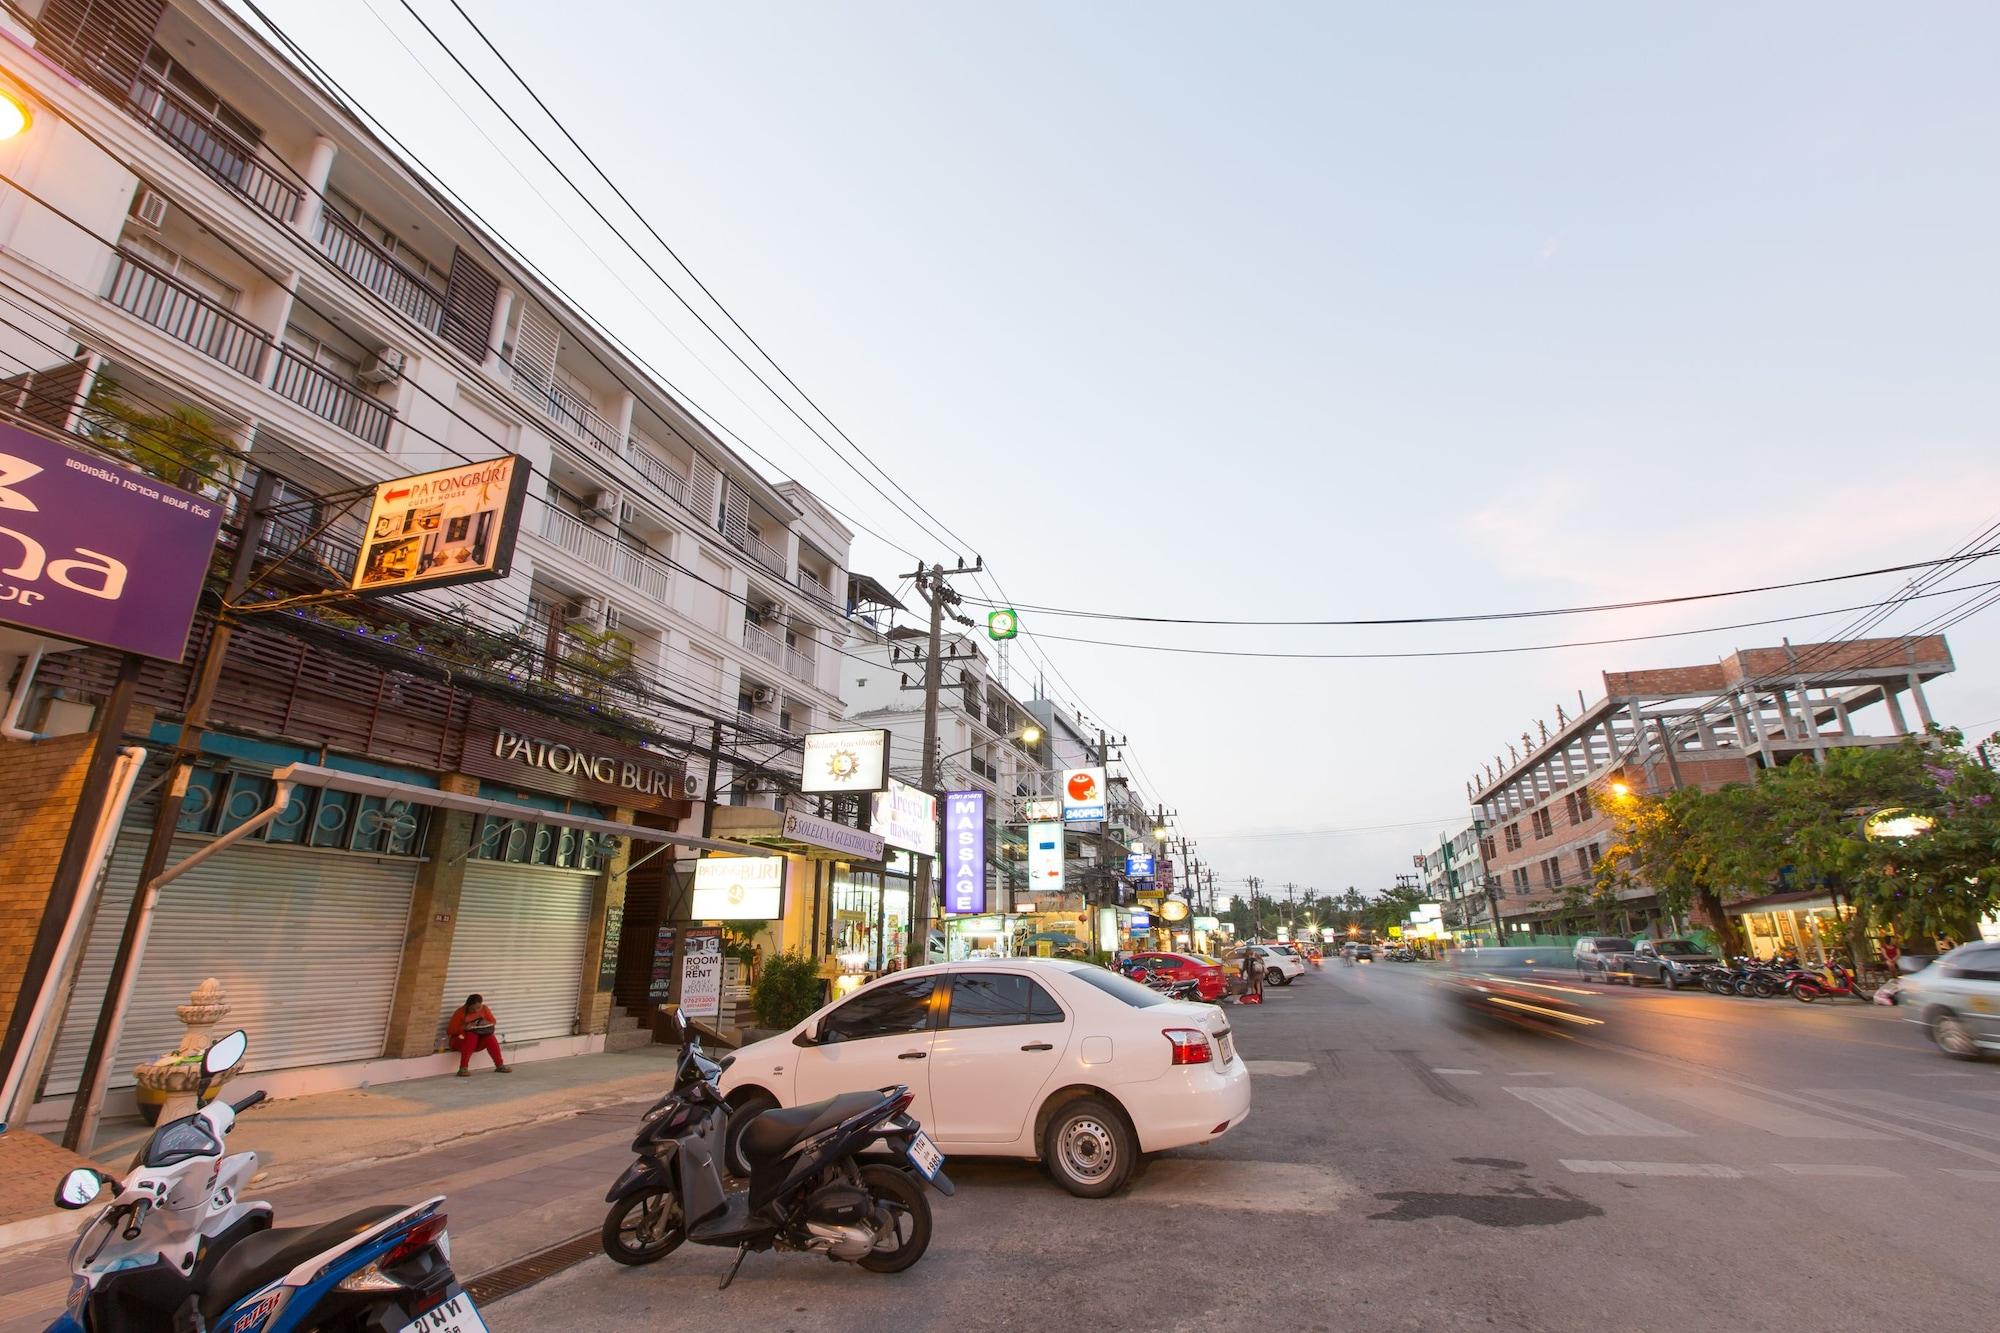 Patong Buri Hotel, Pulau Phuket